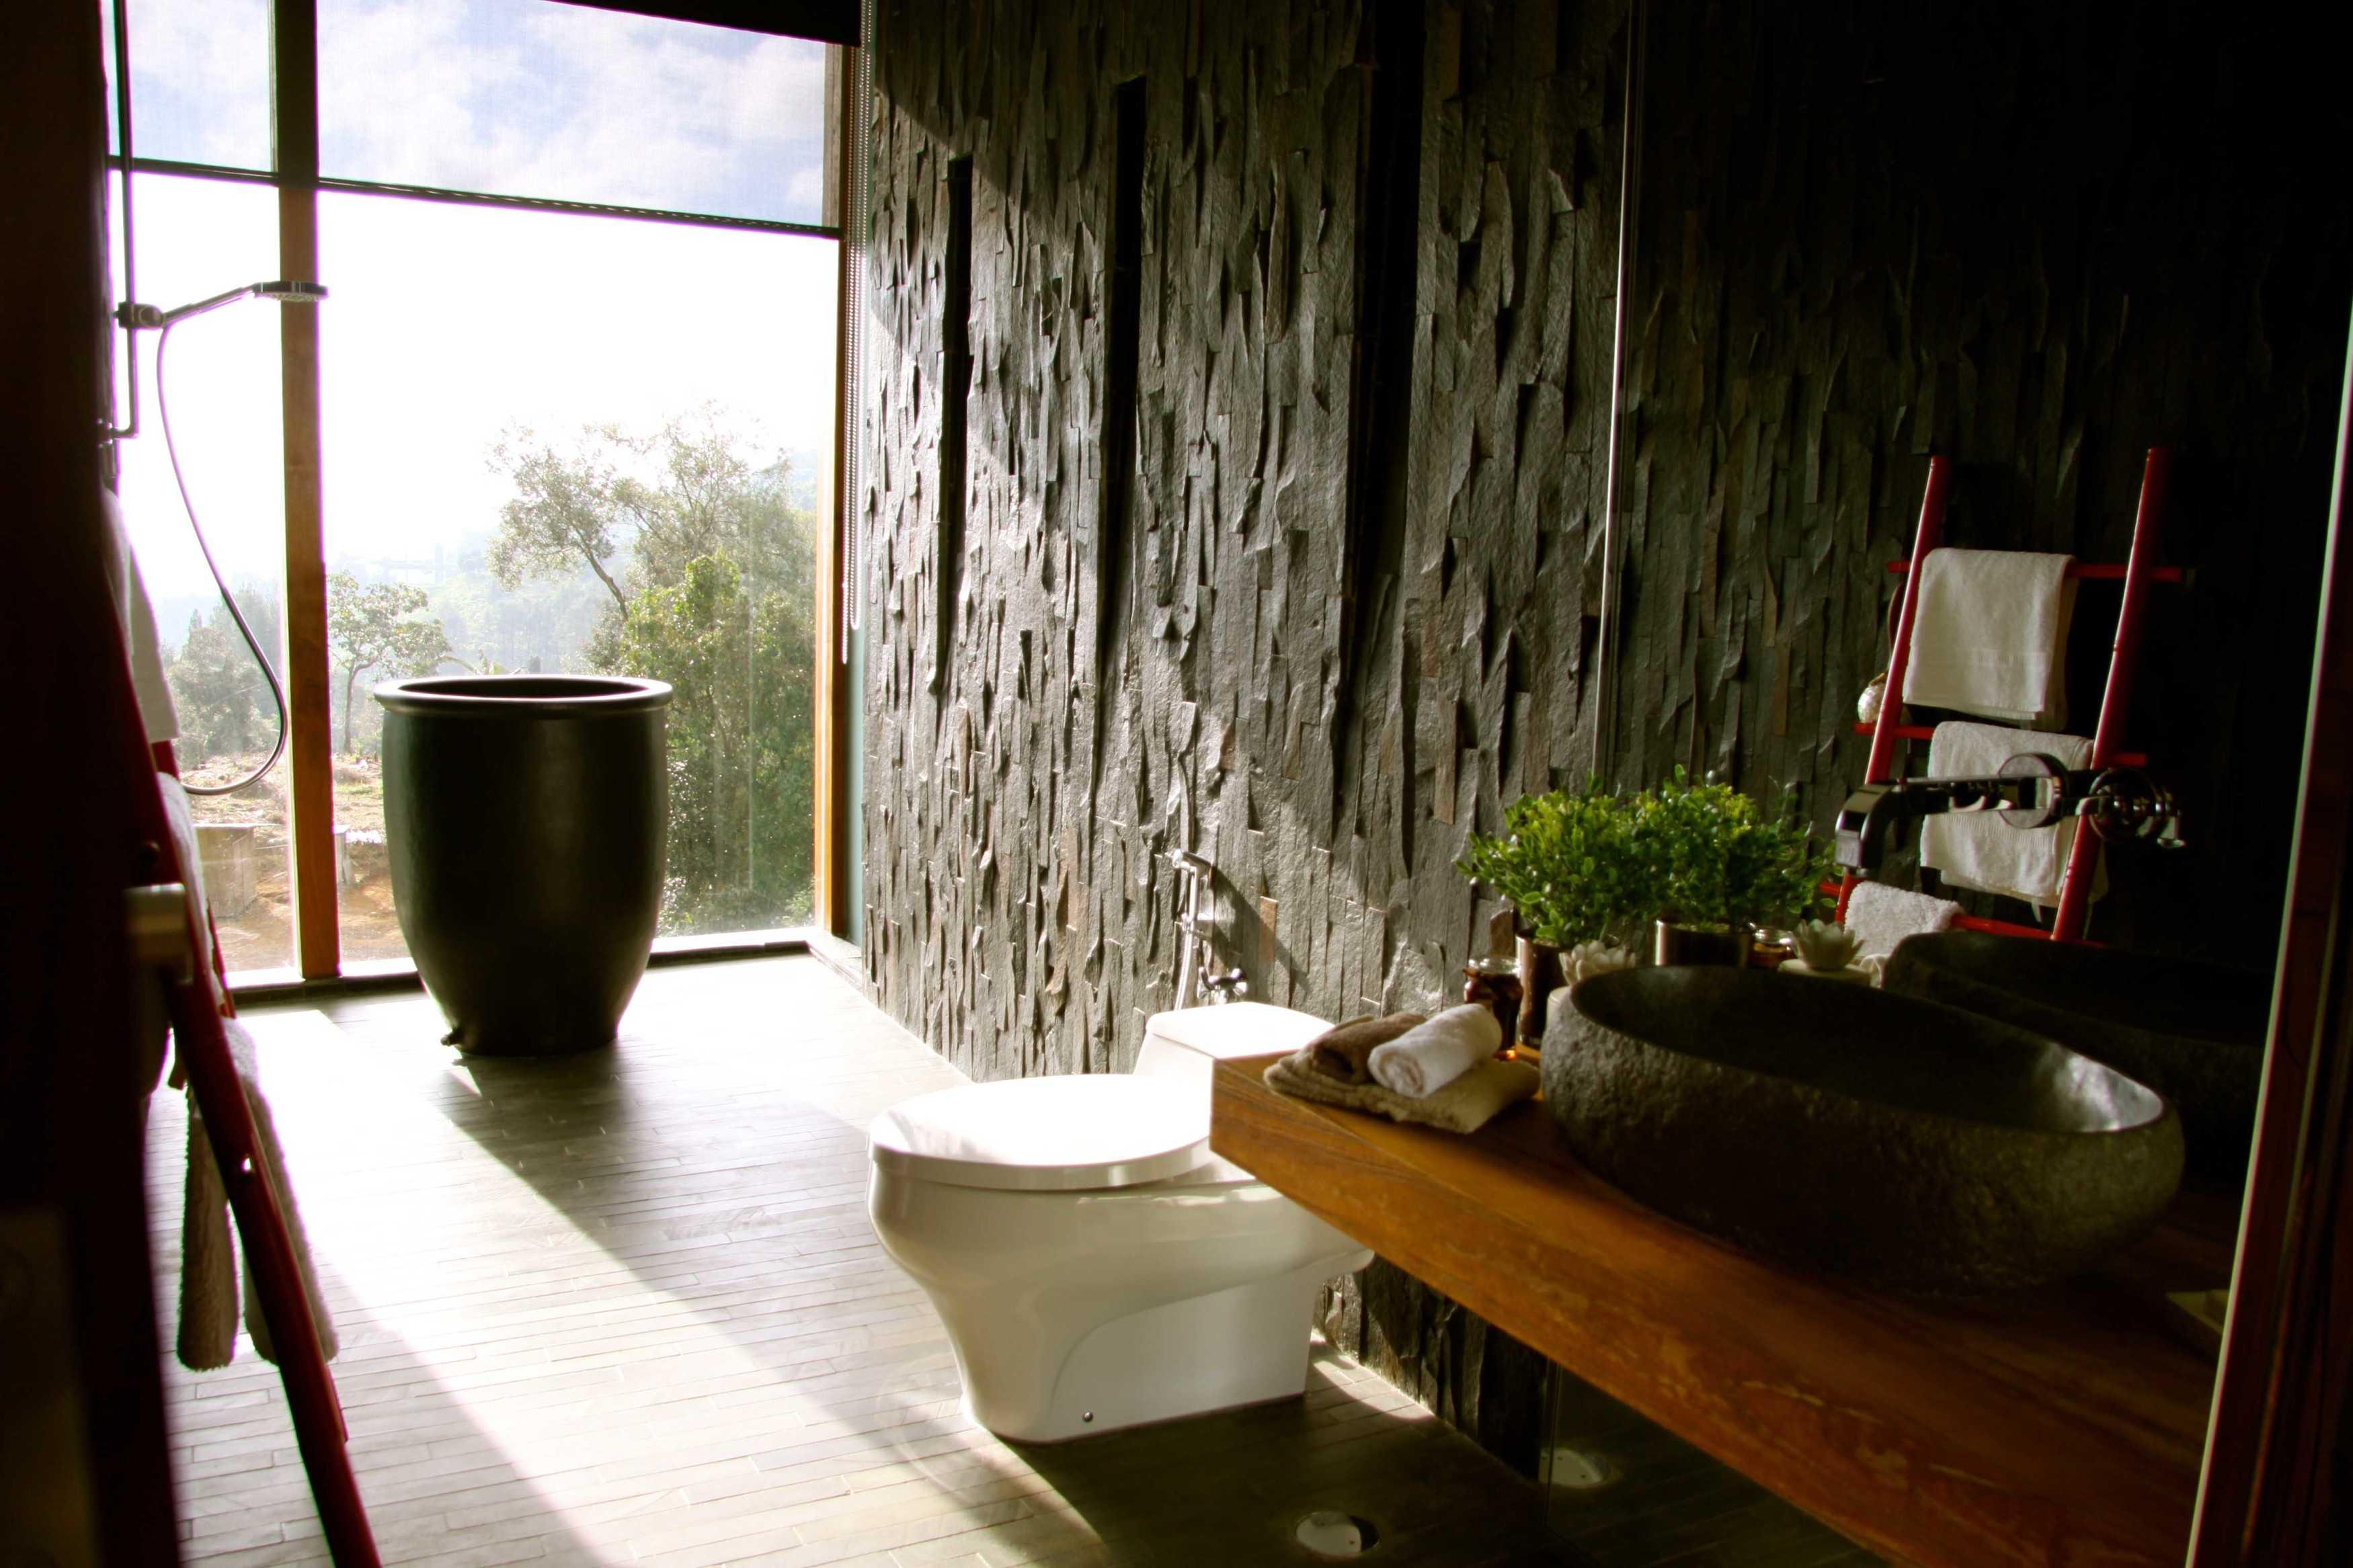 Rudy Dodo Private Villa Cilember, Puncak - Bogor Cilember, Puncak - Bogor Bathroom   9183